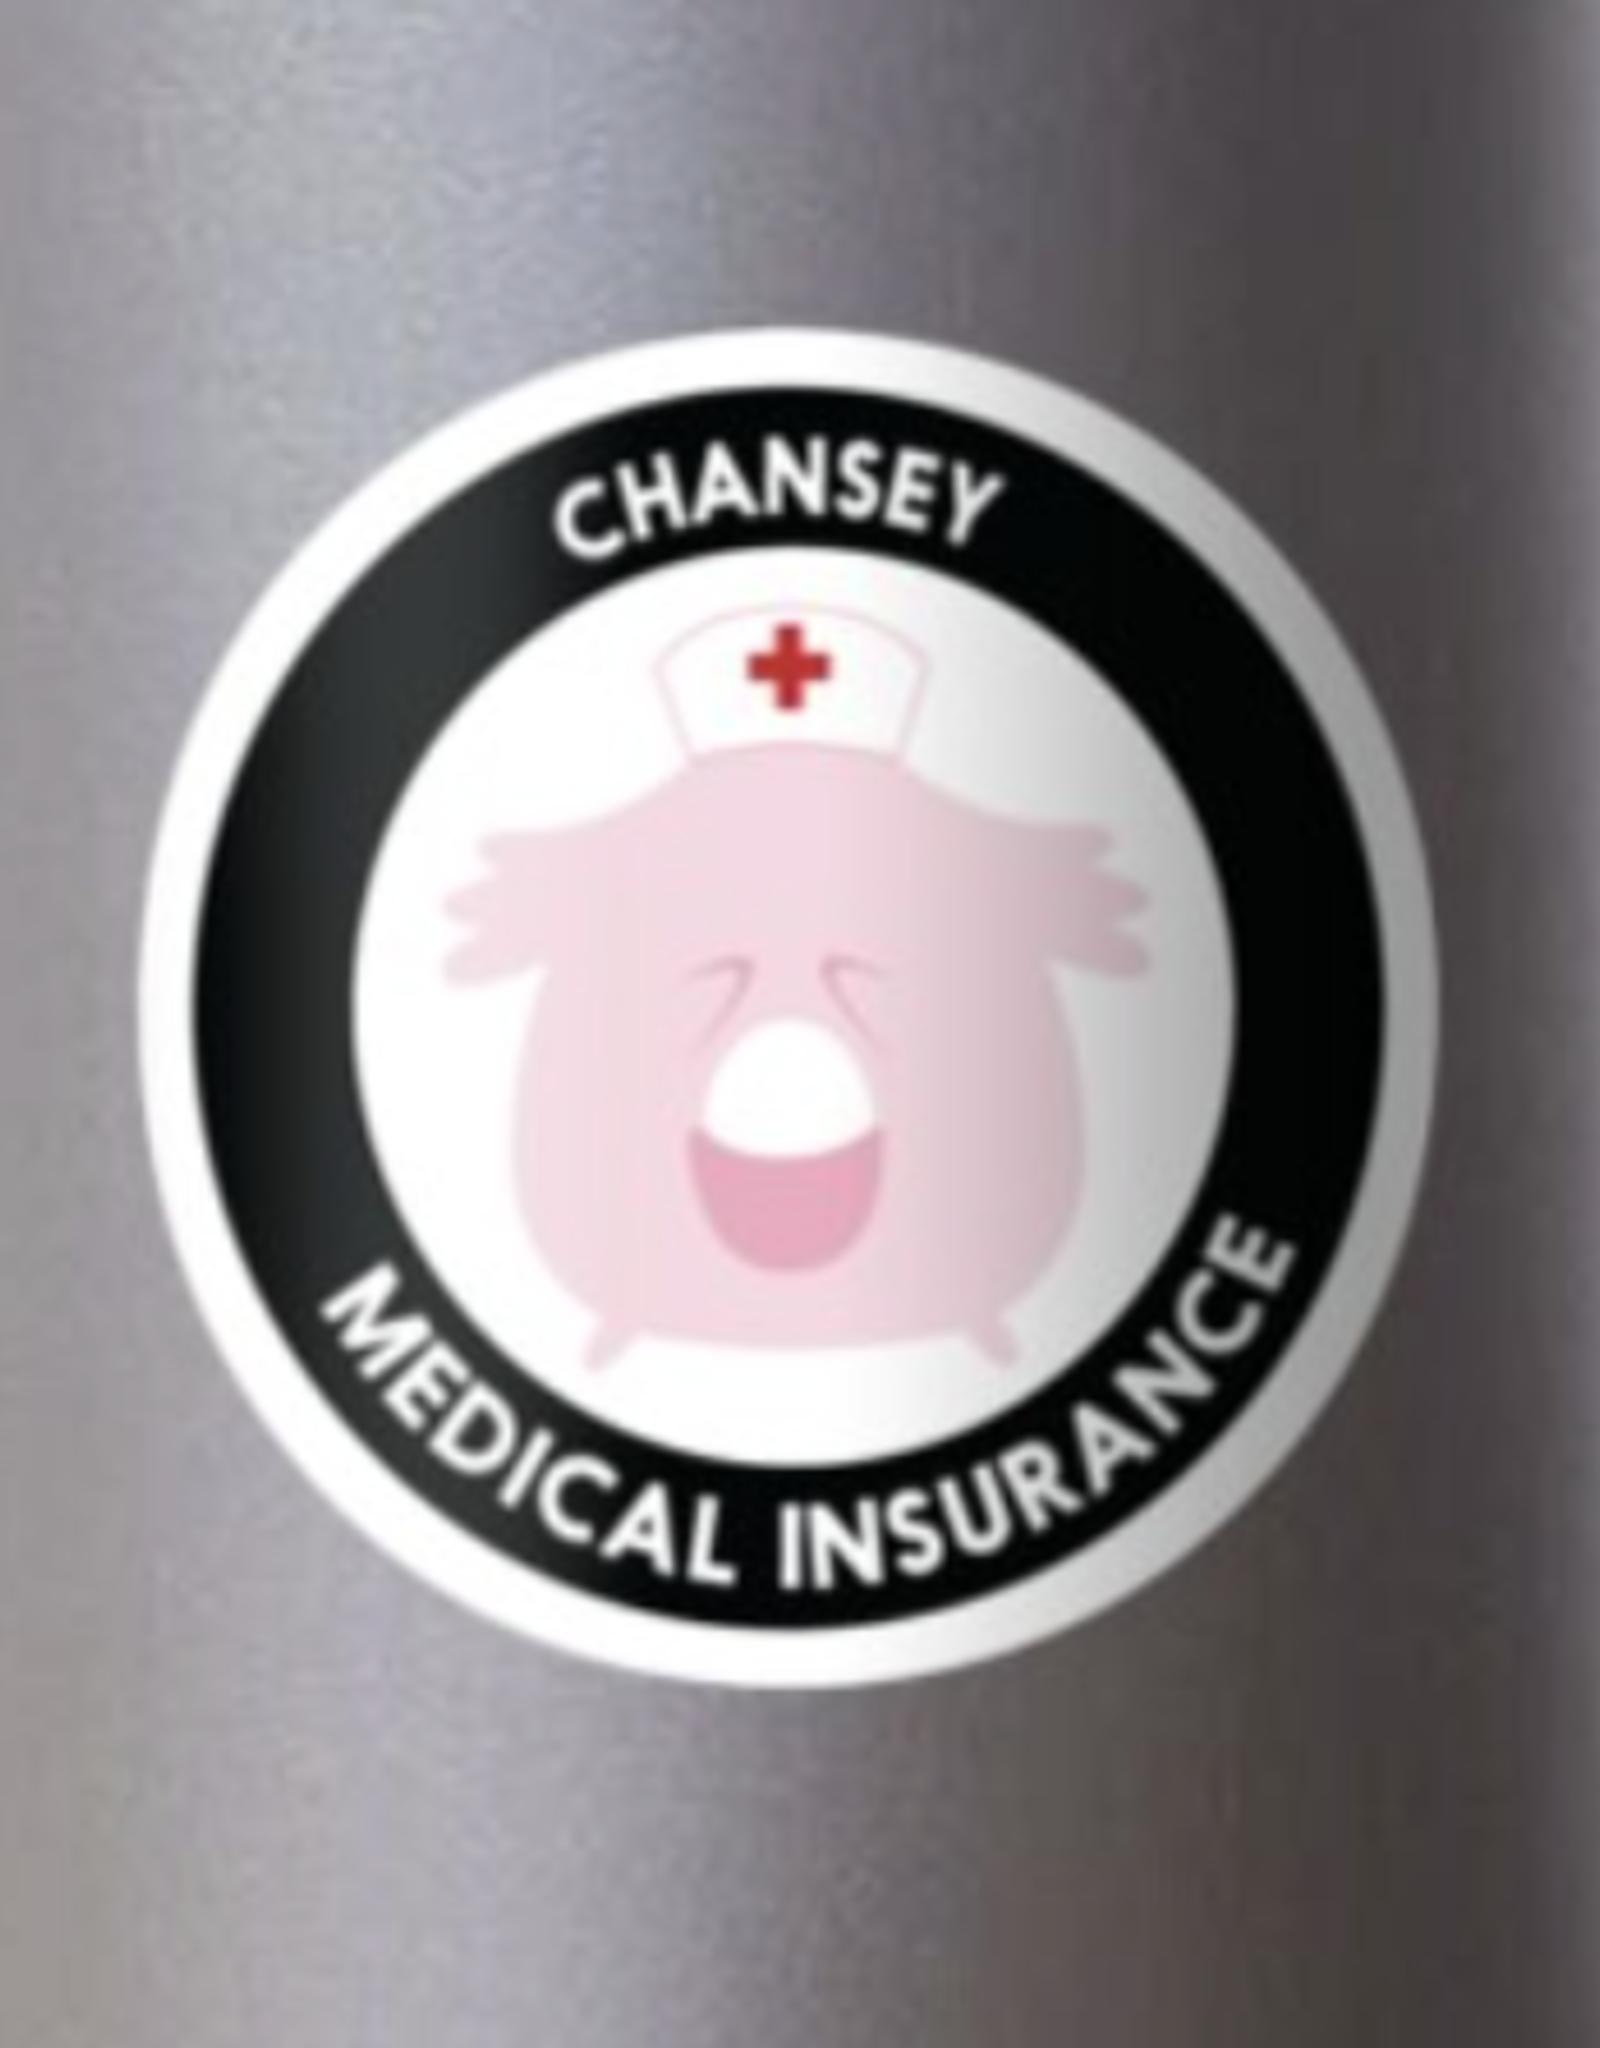 Chansey Medical Insurance Sticker